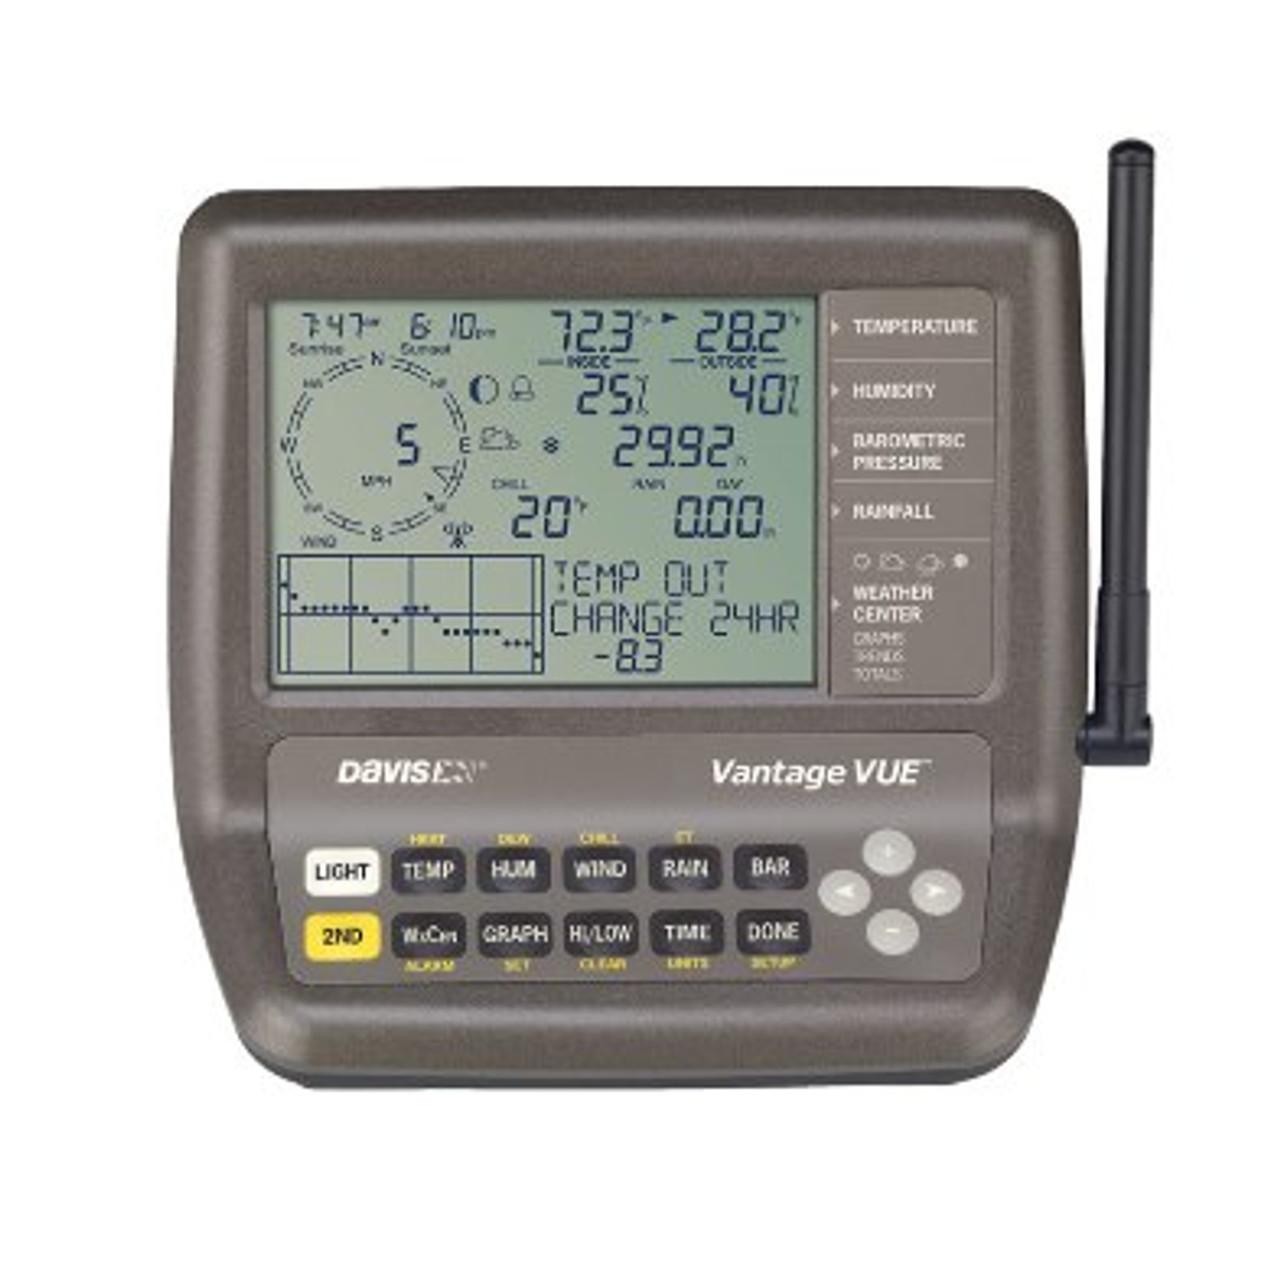 Davis 6351 Vantage Vue Console/Receiver